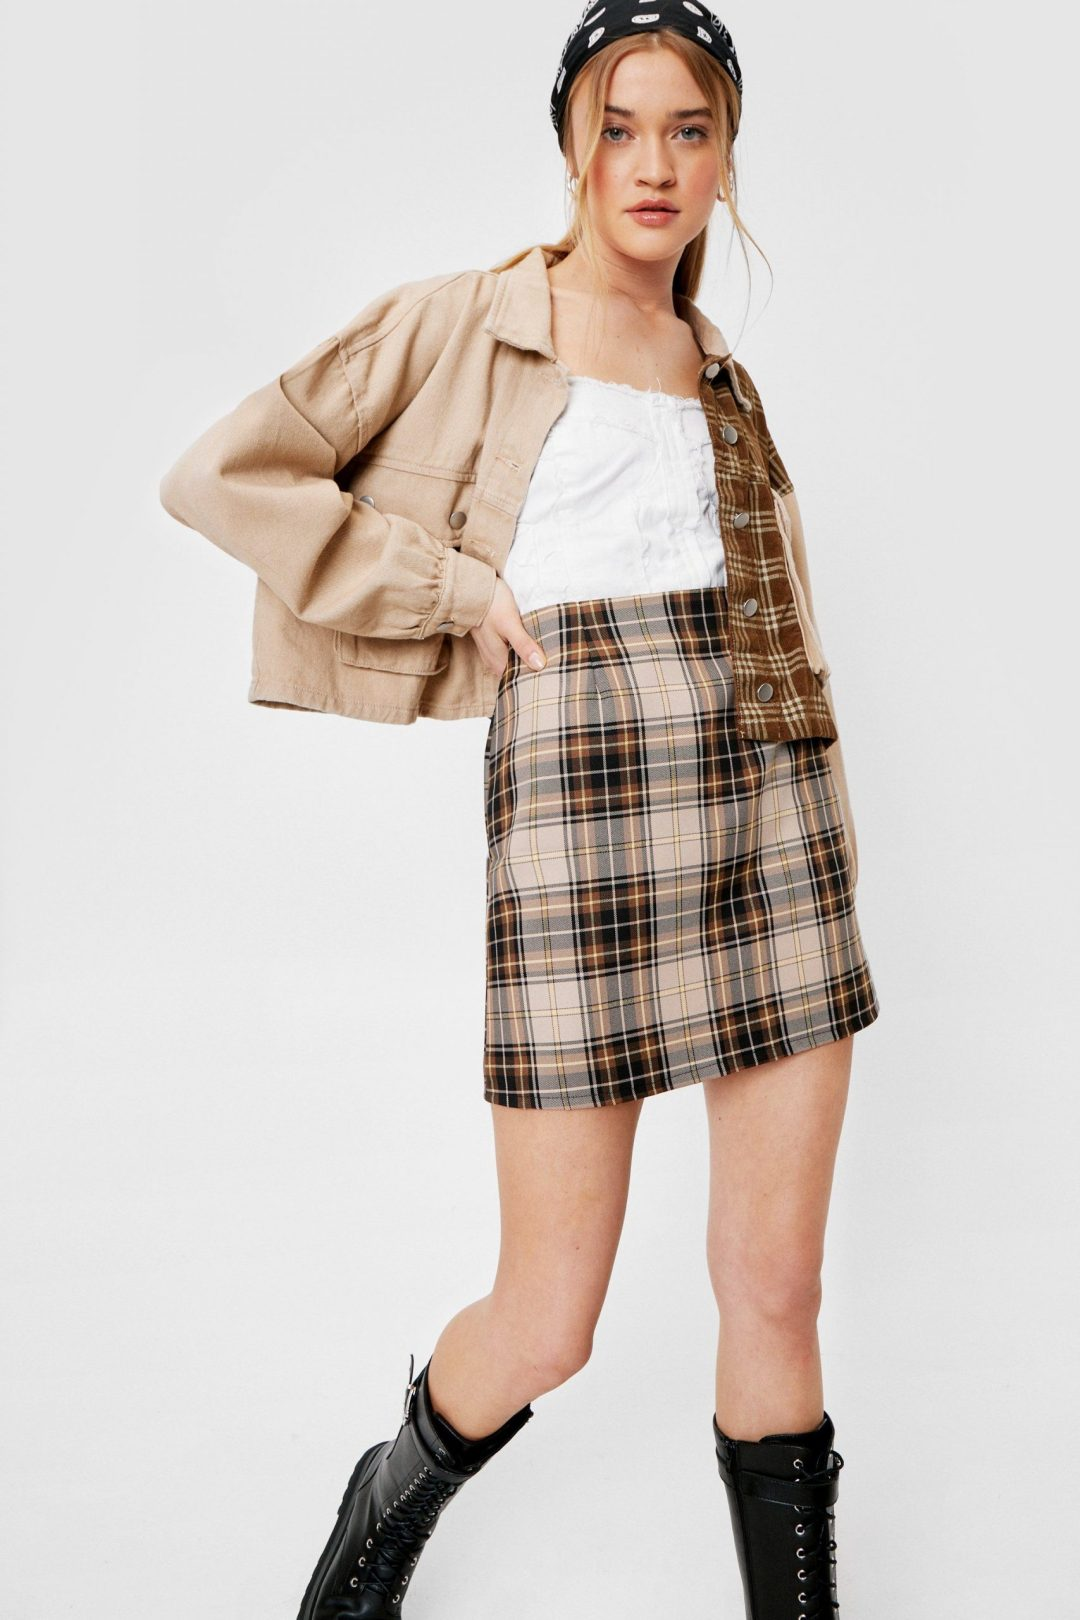 Plaid mini skirt for dark academia outfits